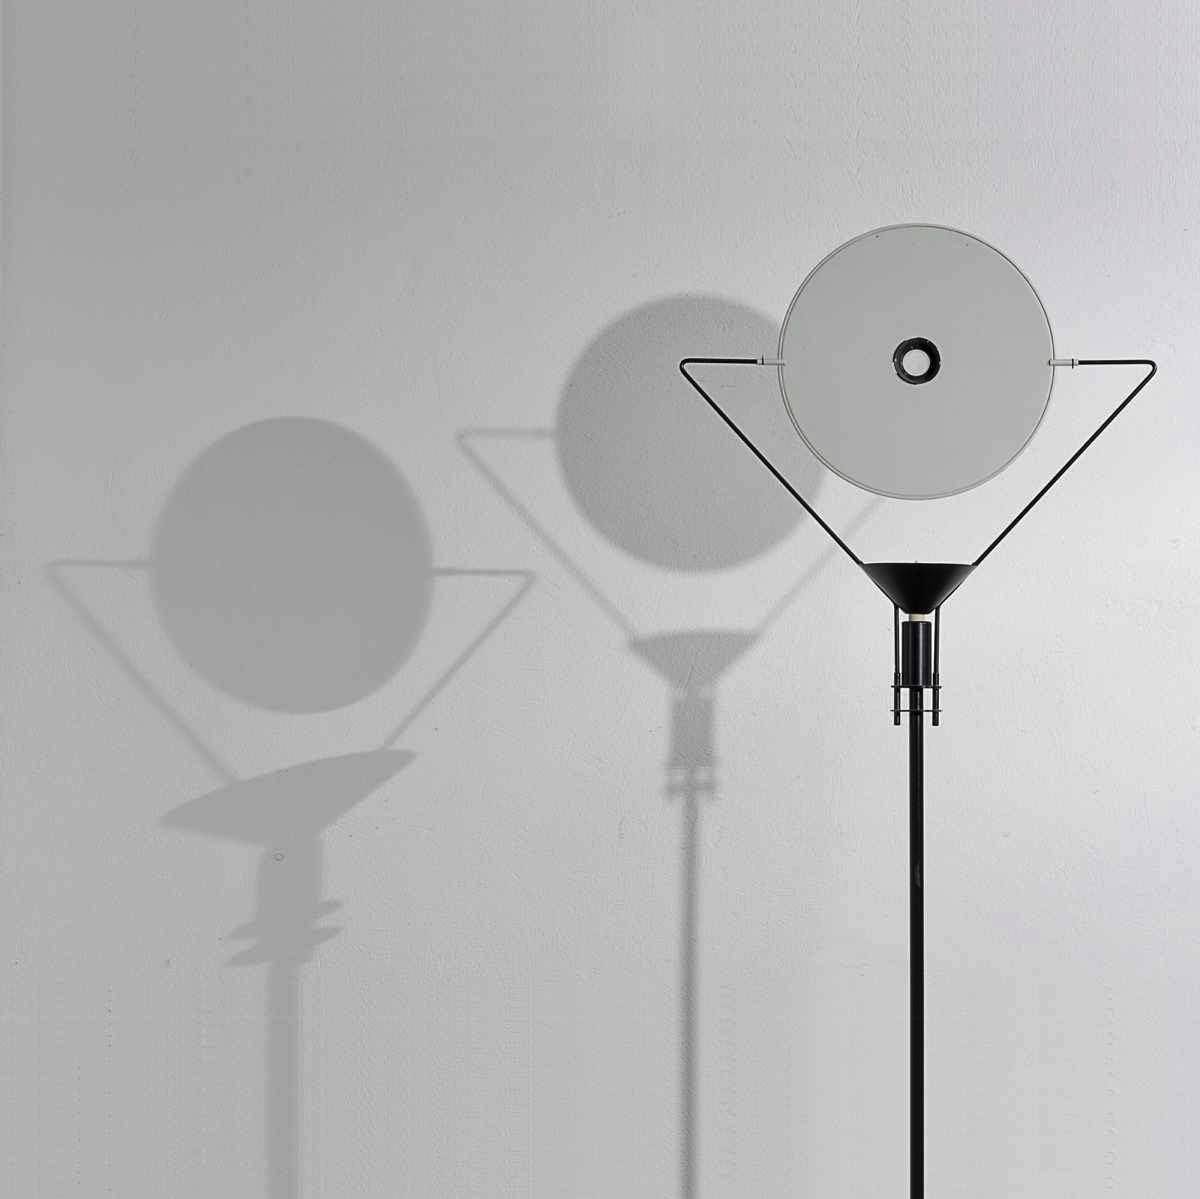 Carlo-Forcolini-Stehlampe